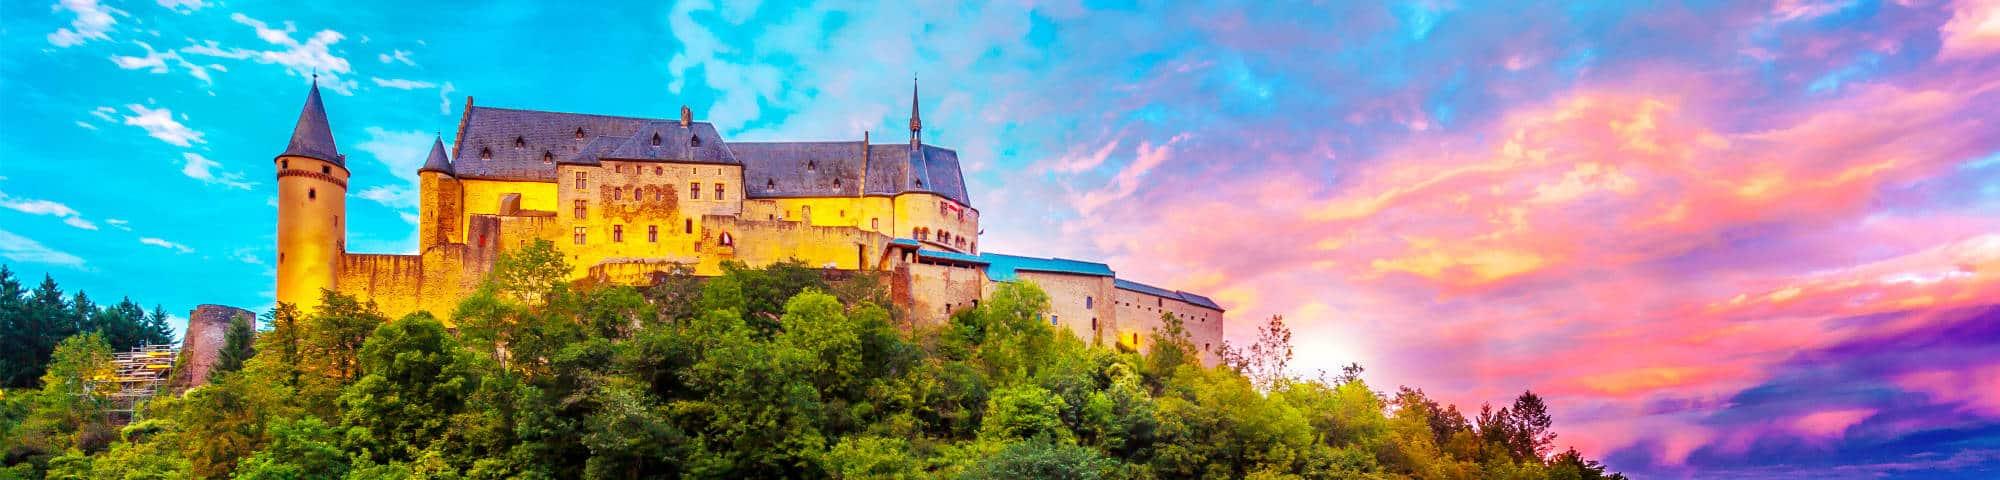 Vakantiehuis luxemburg vakantie in luxemburg belvilla for Vakantie luxemburg